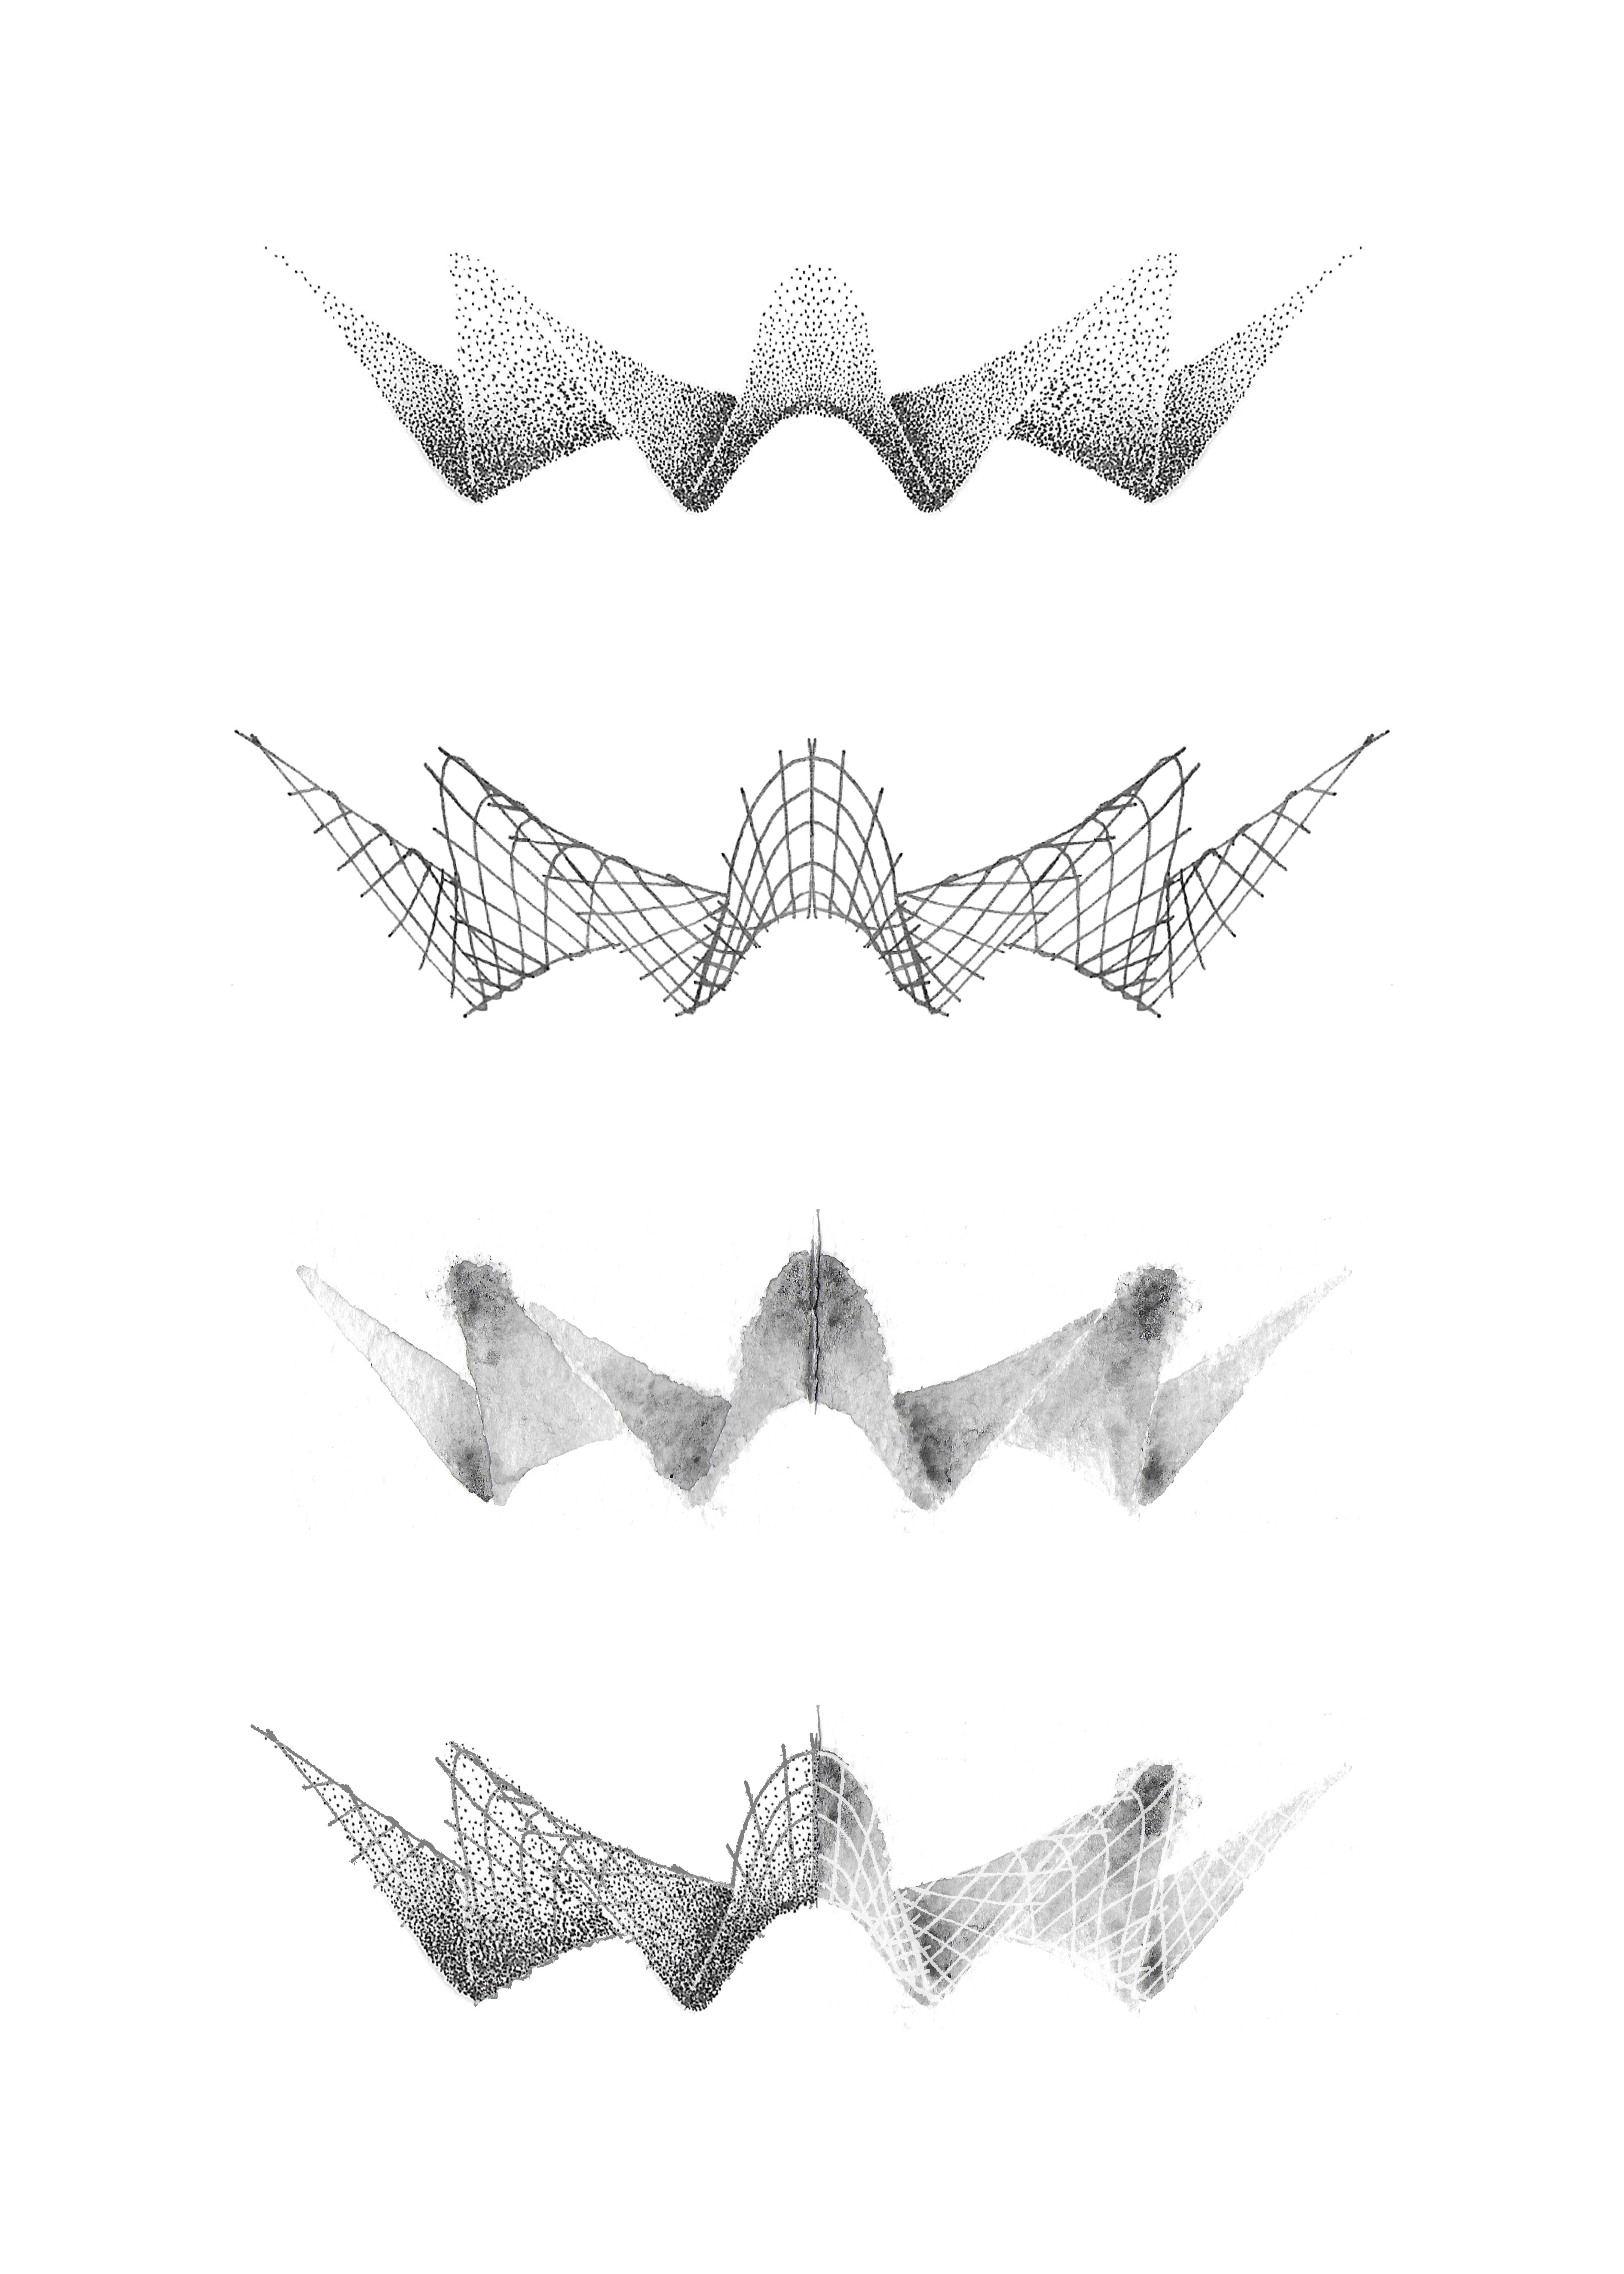 COMPLEJIDAD-Dibujo_EricMoya-MiquelPerez.jpg